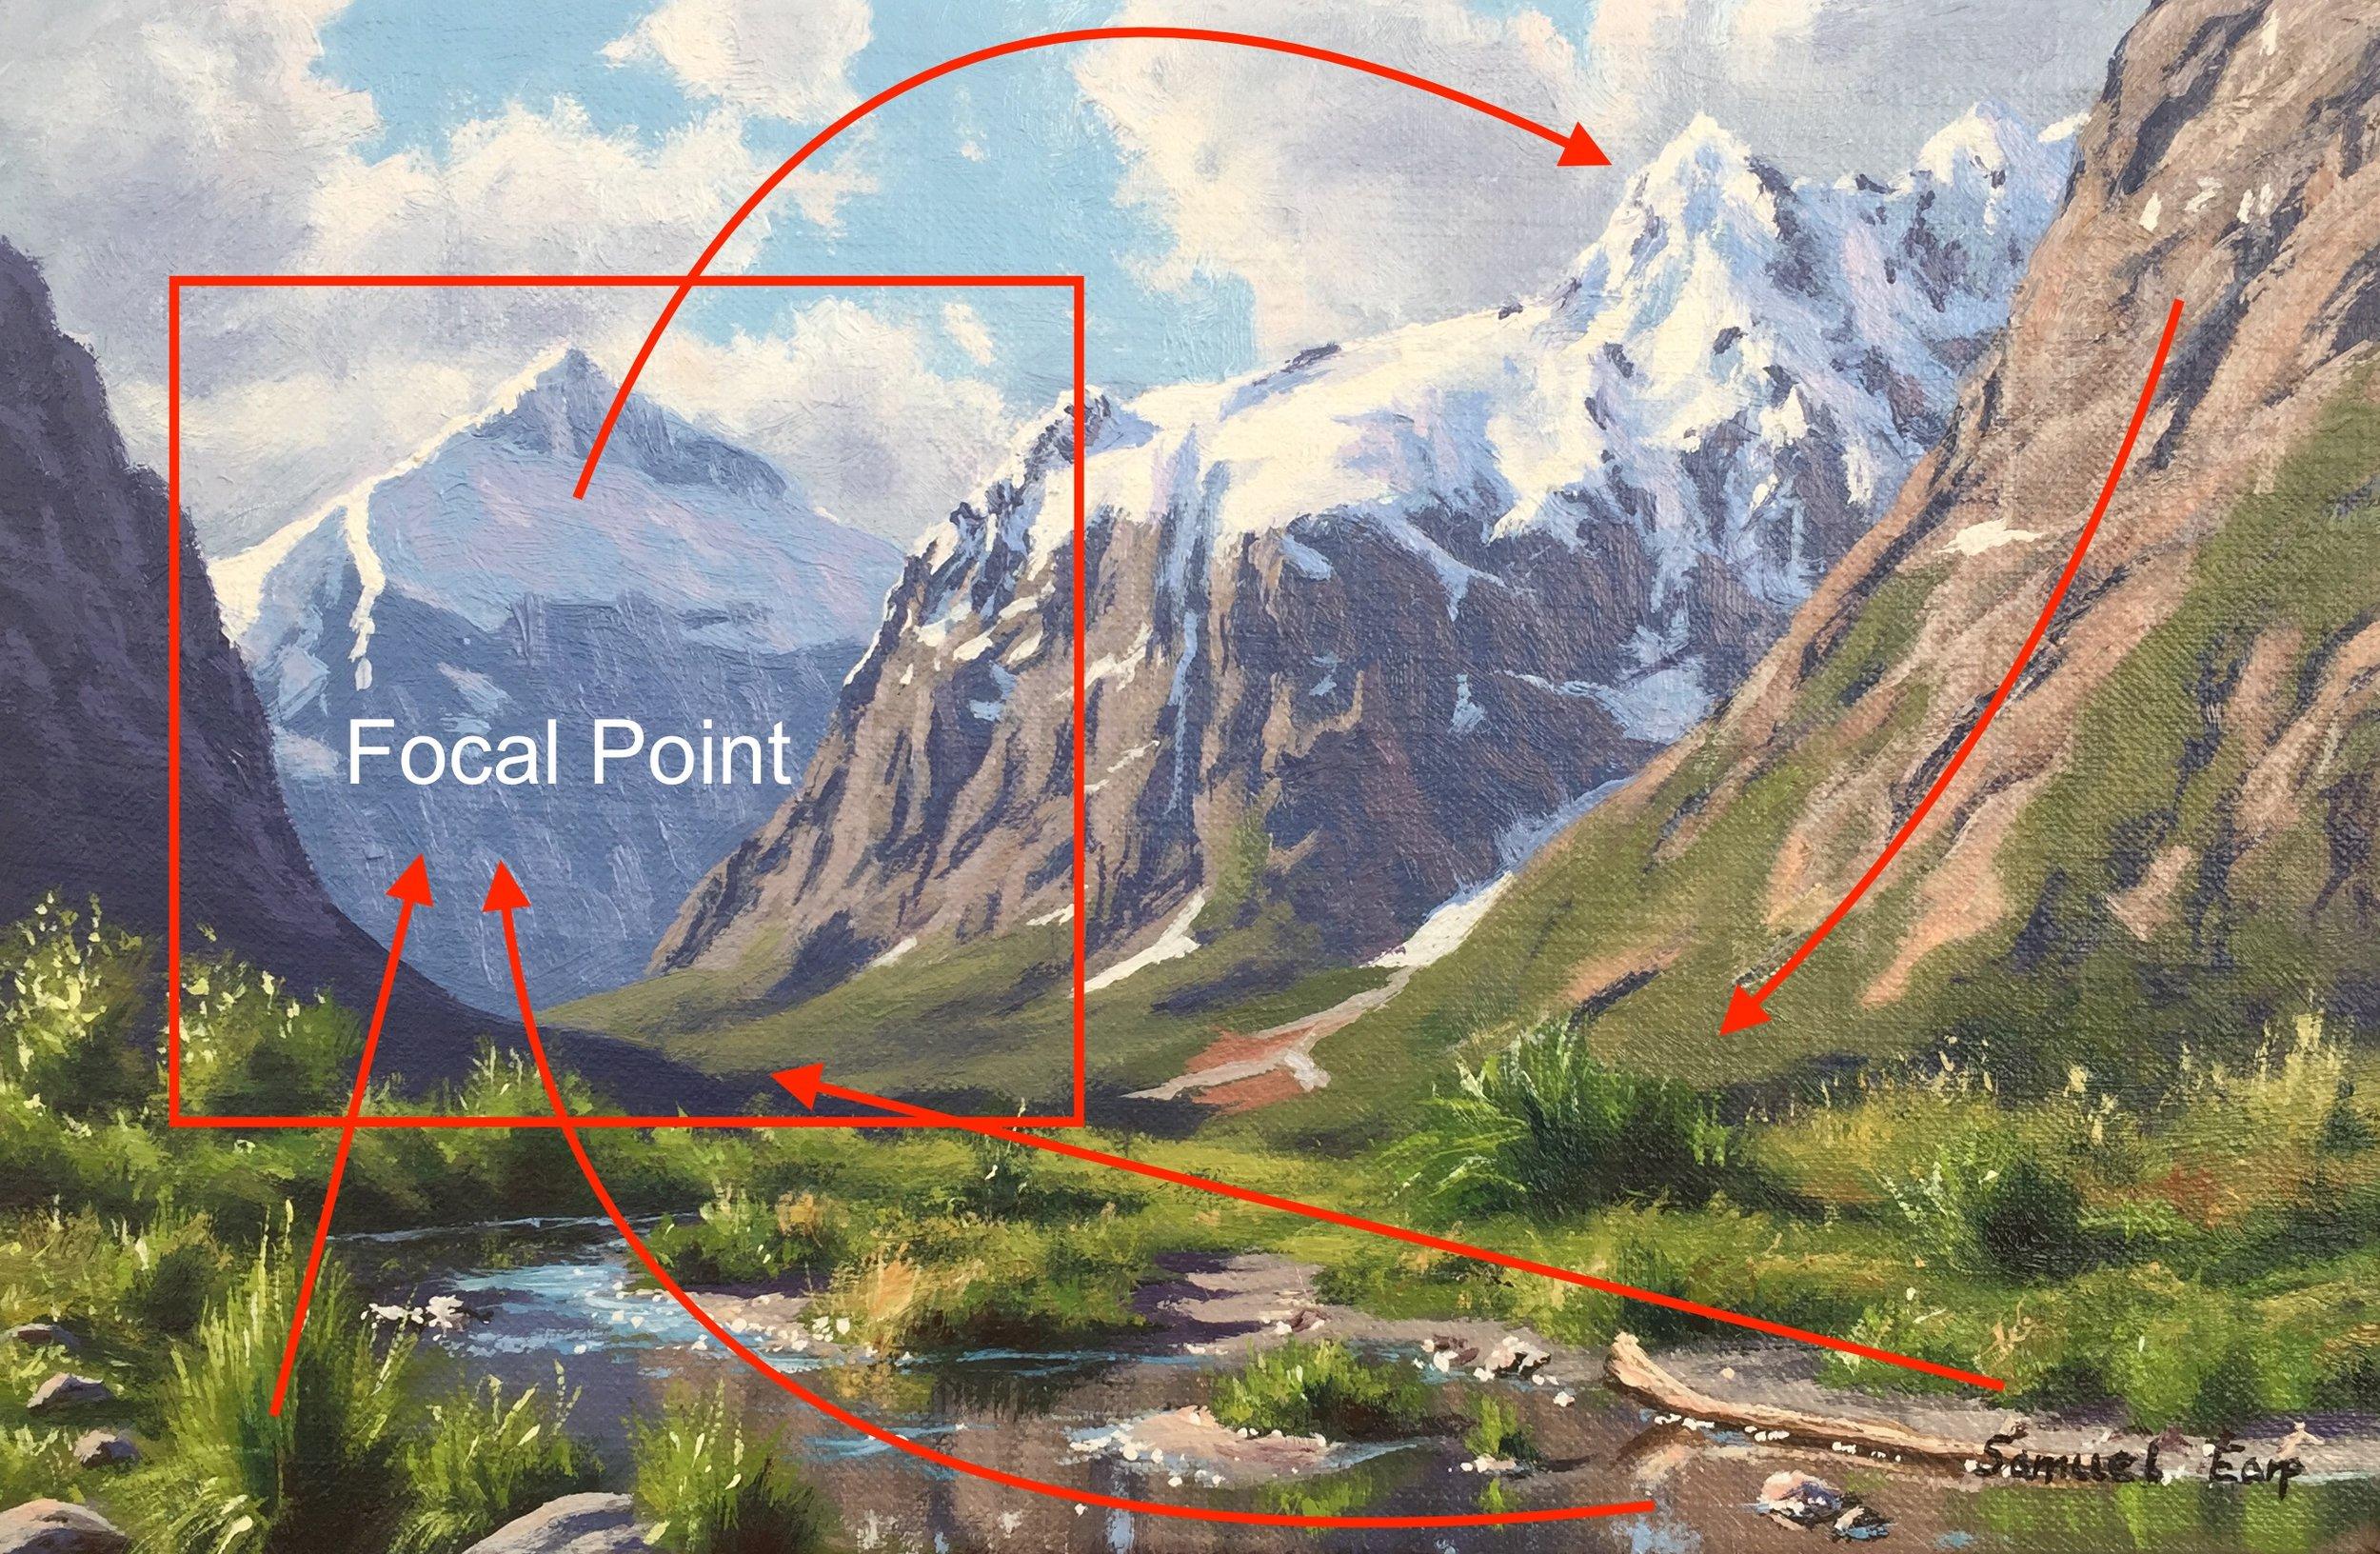 Mt Talbot and Mt Crosscut - Composition - small painting - Samuel Earp landscape artist.jpg